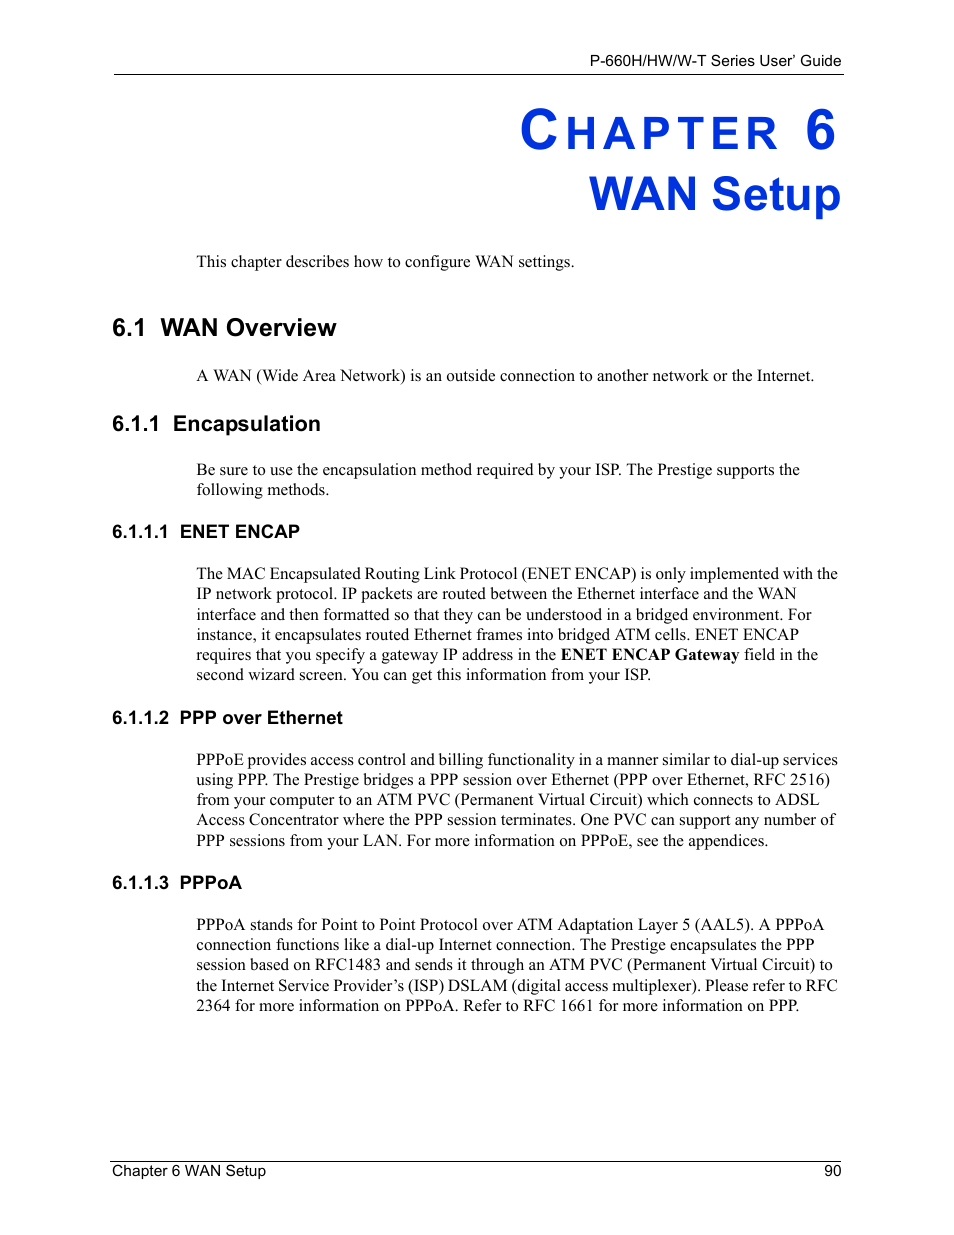 Wan setup, 1 encapsulation, 1 enet encap   ZyXEL Communications ADSL